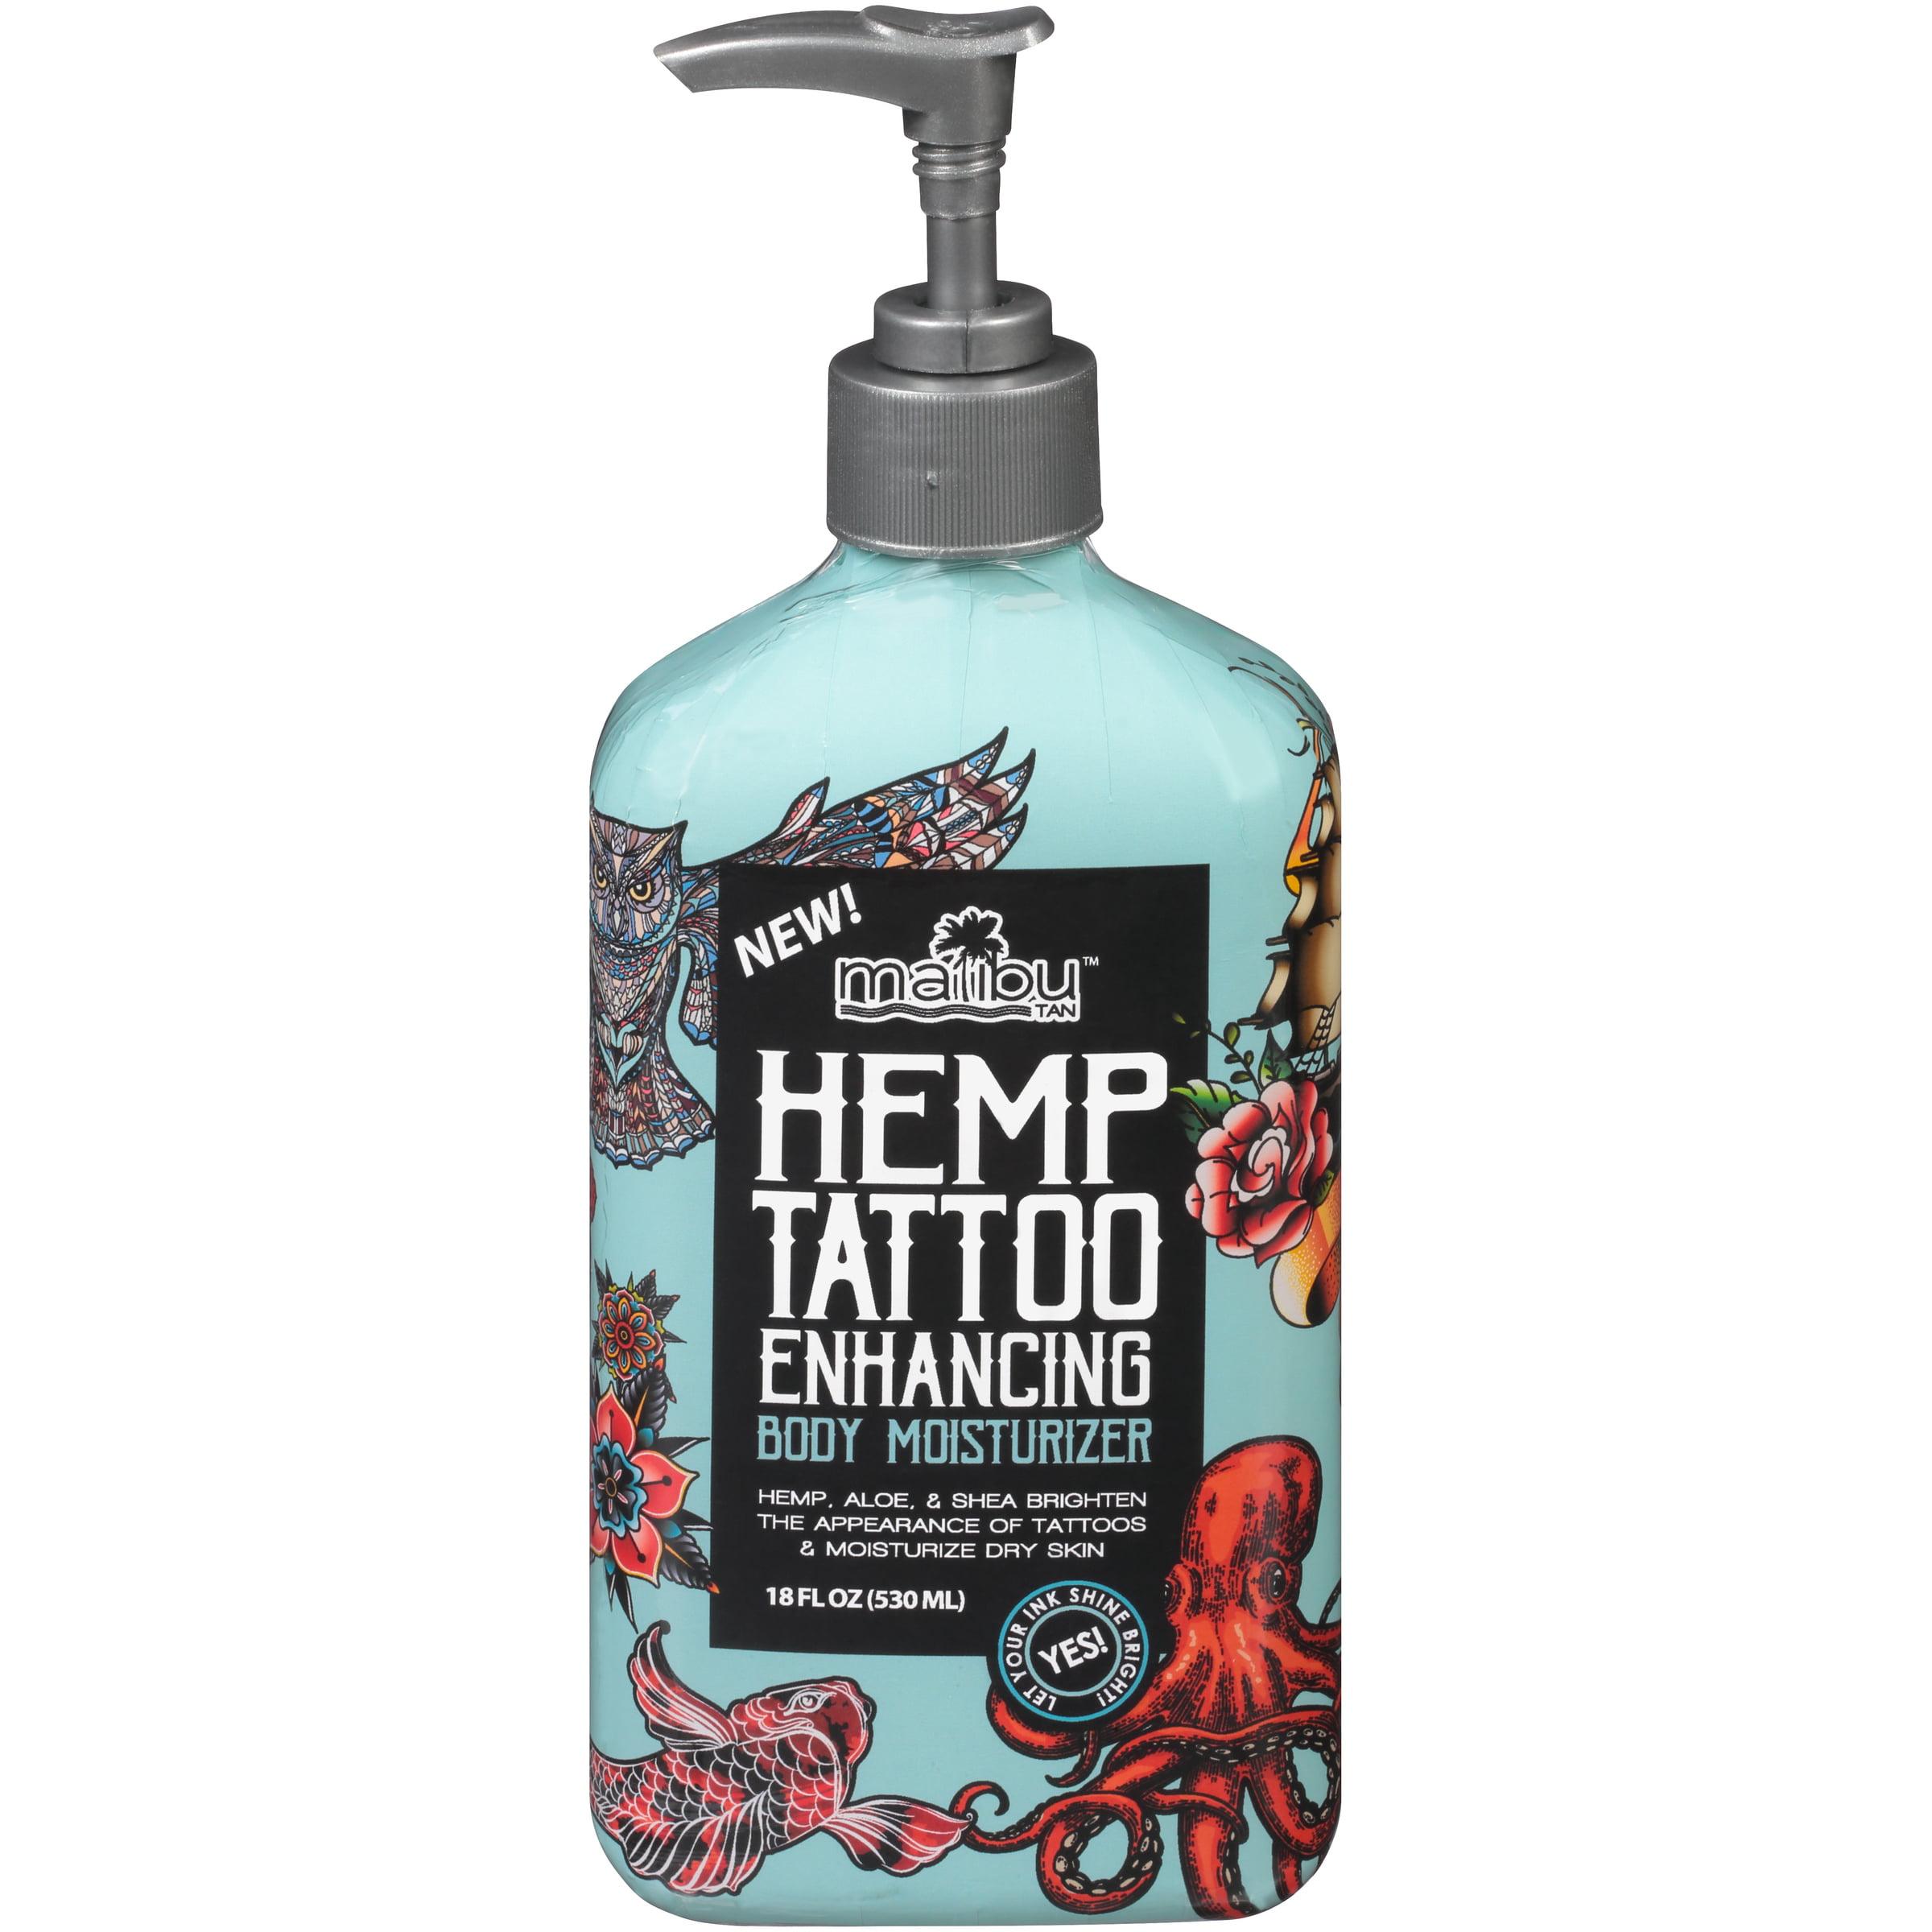 Malibu Tan Hemp Tattoo Enhancing Body Mosisturizer 12 Fl Oz